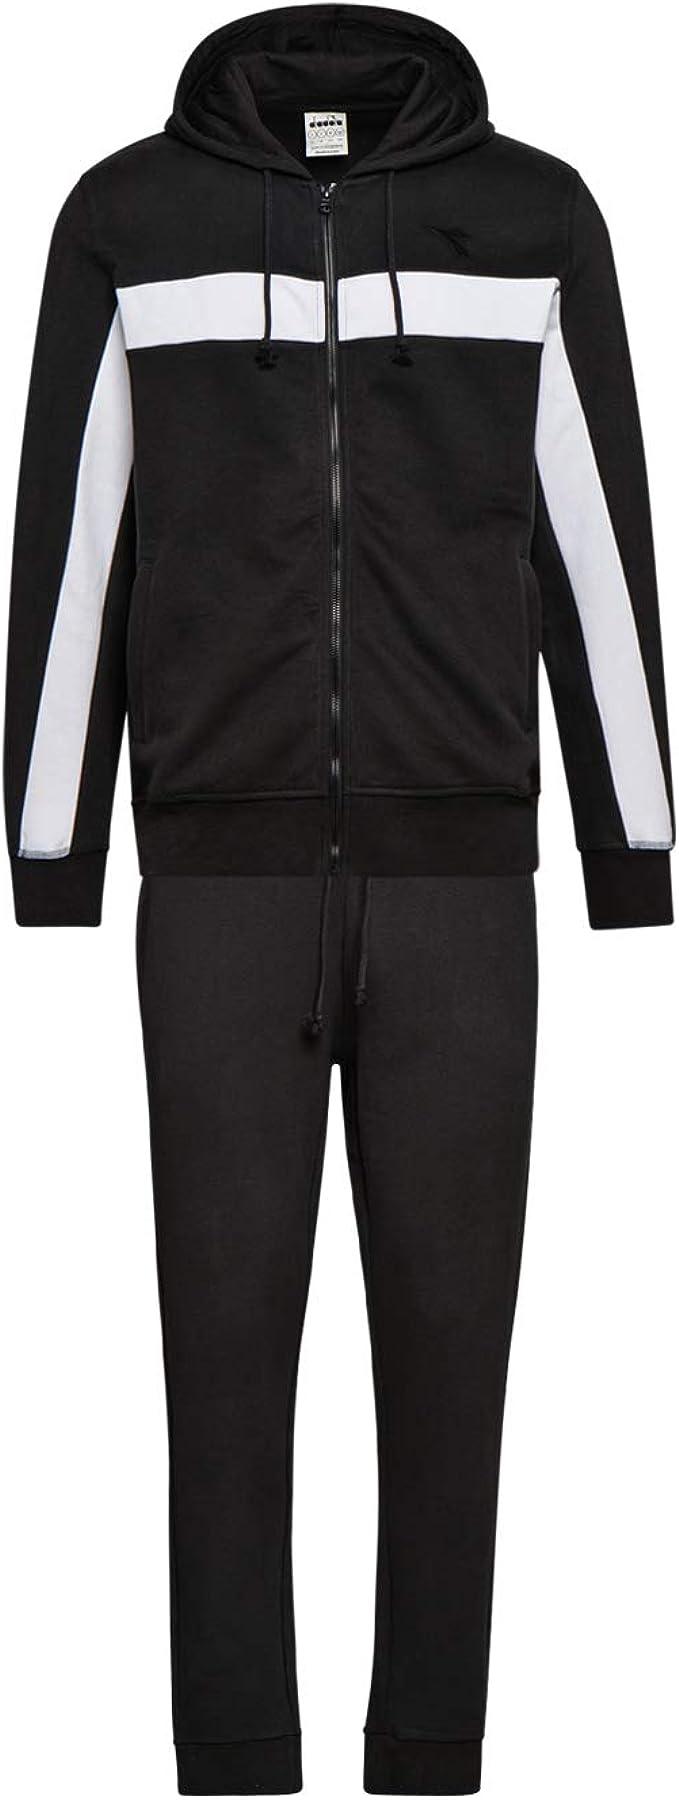 Diadora Tuta HD FZ Suit BLKBAR per Uomo